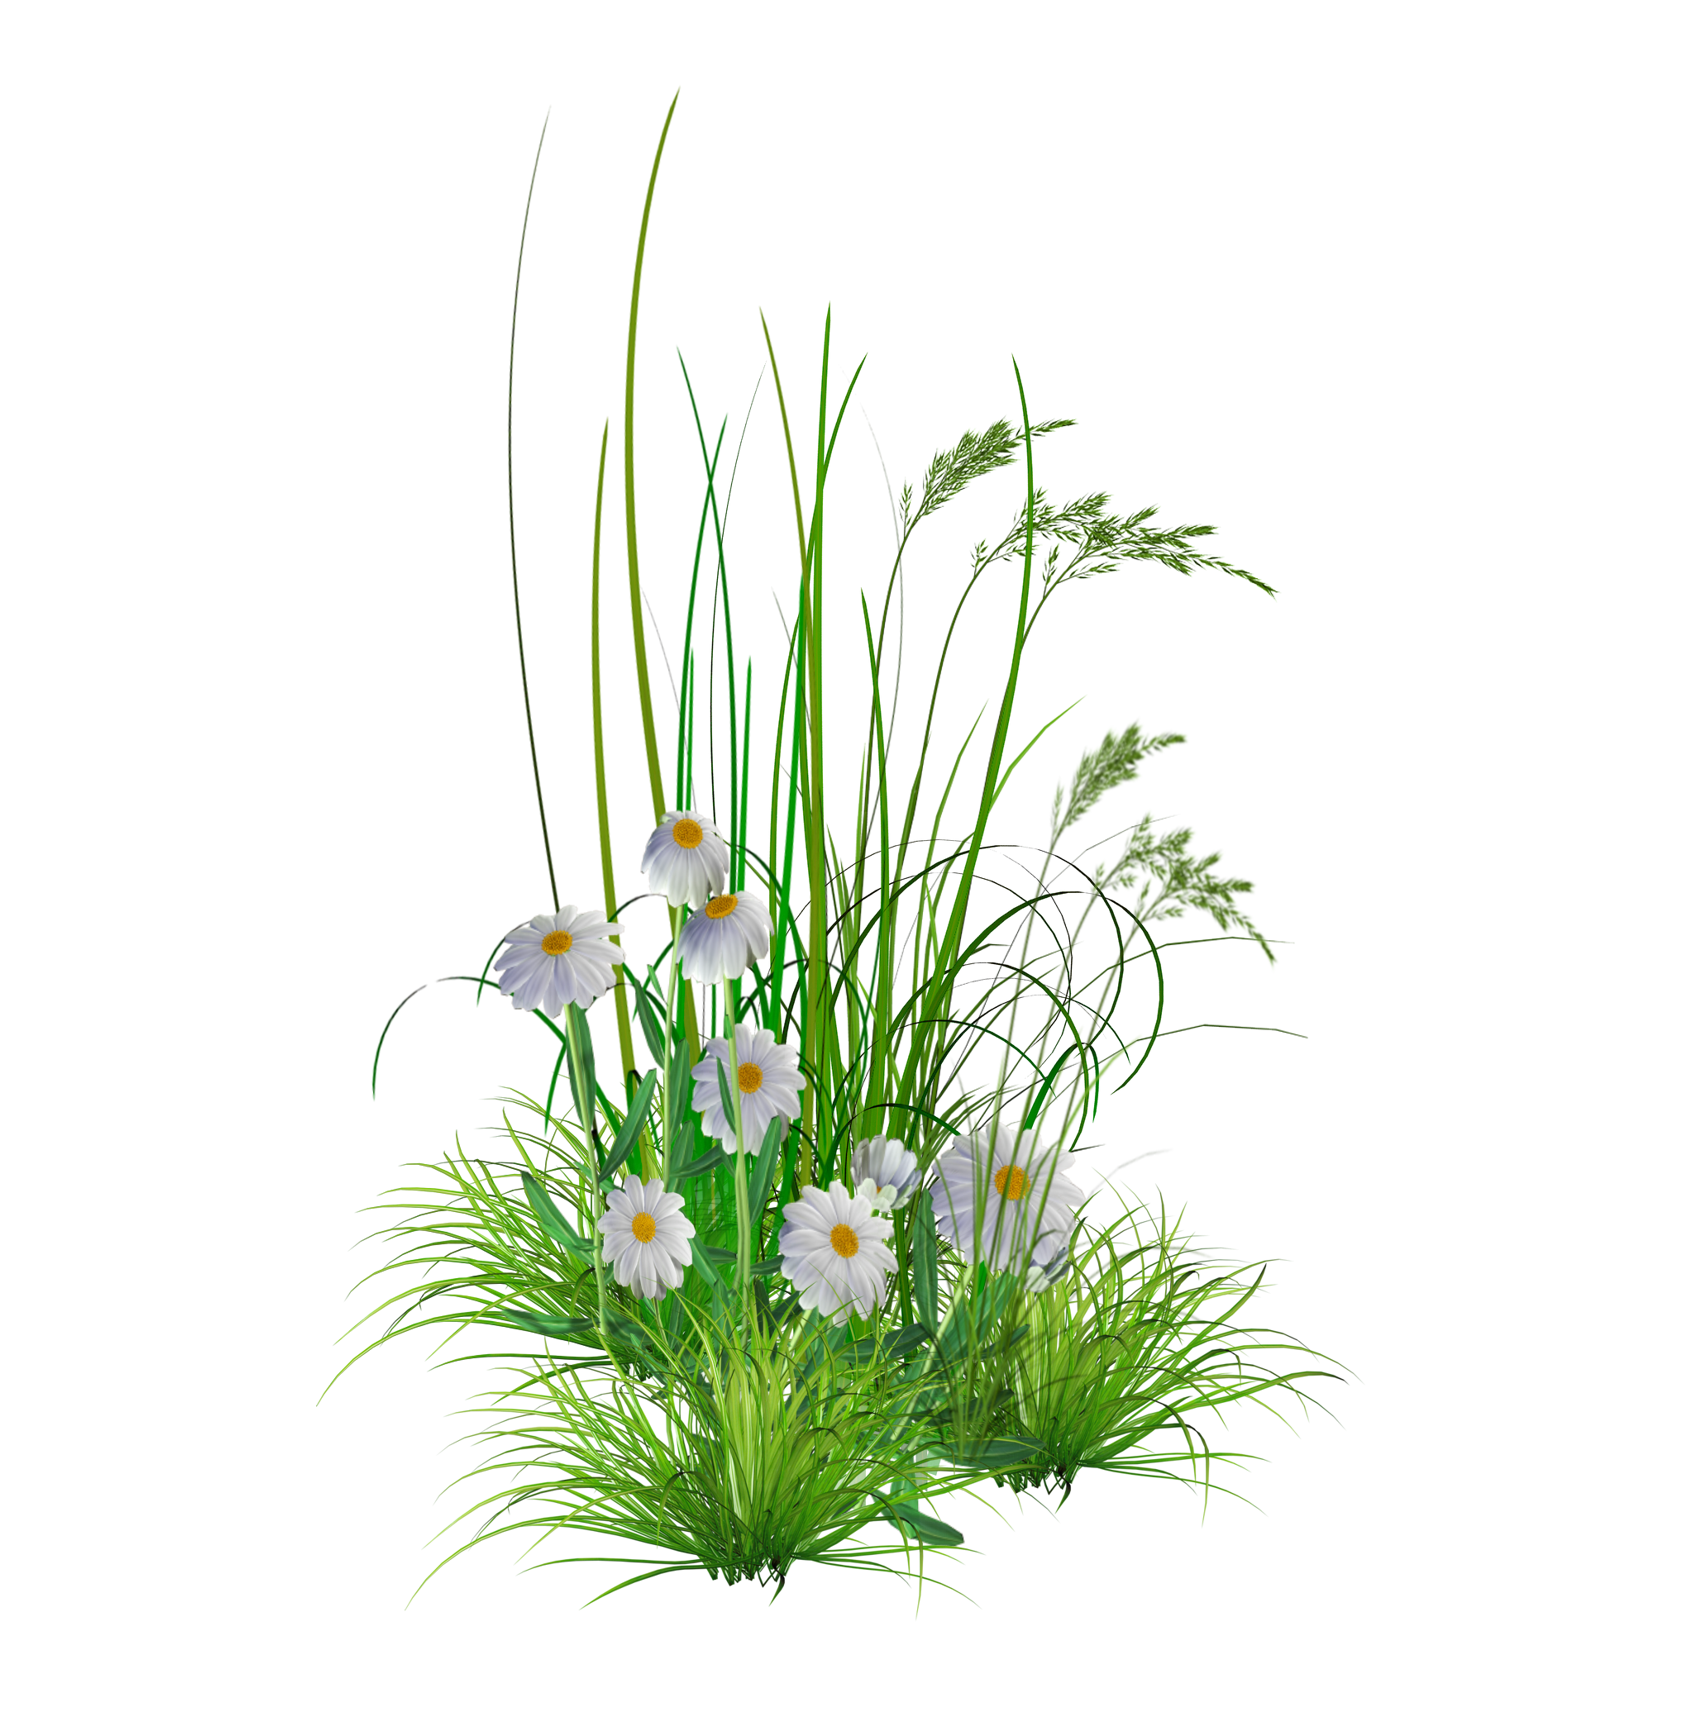 Flower garden Lawn Clip art.